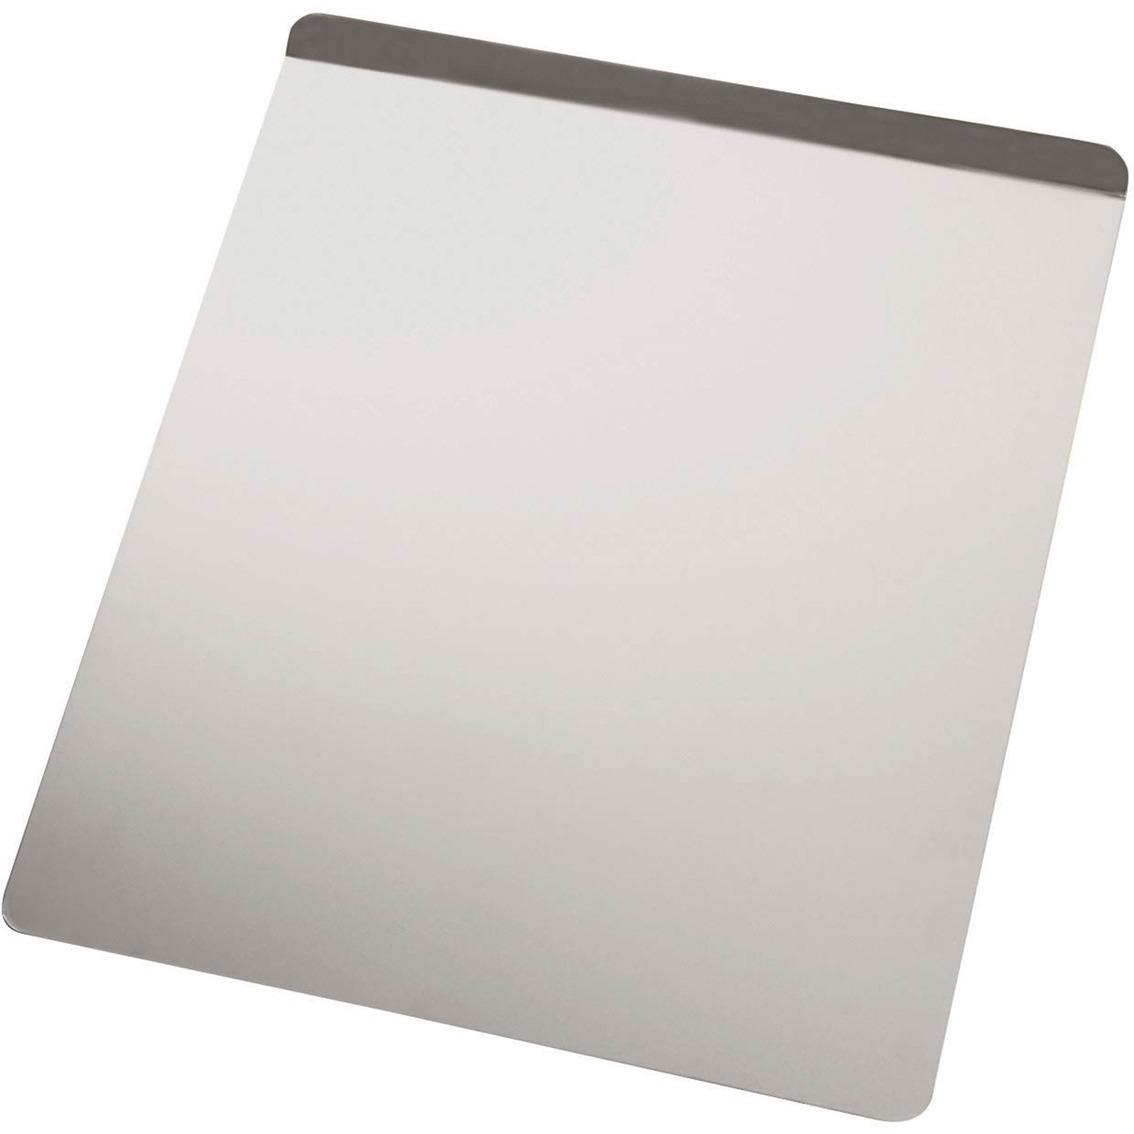 Wilton Insulated Aluminum Cookie Sheet